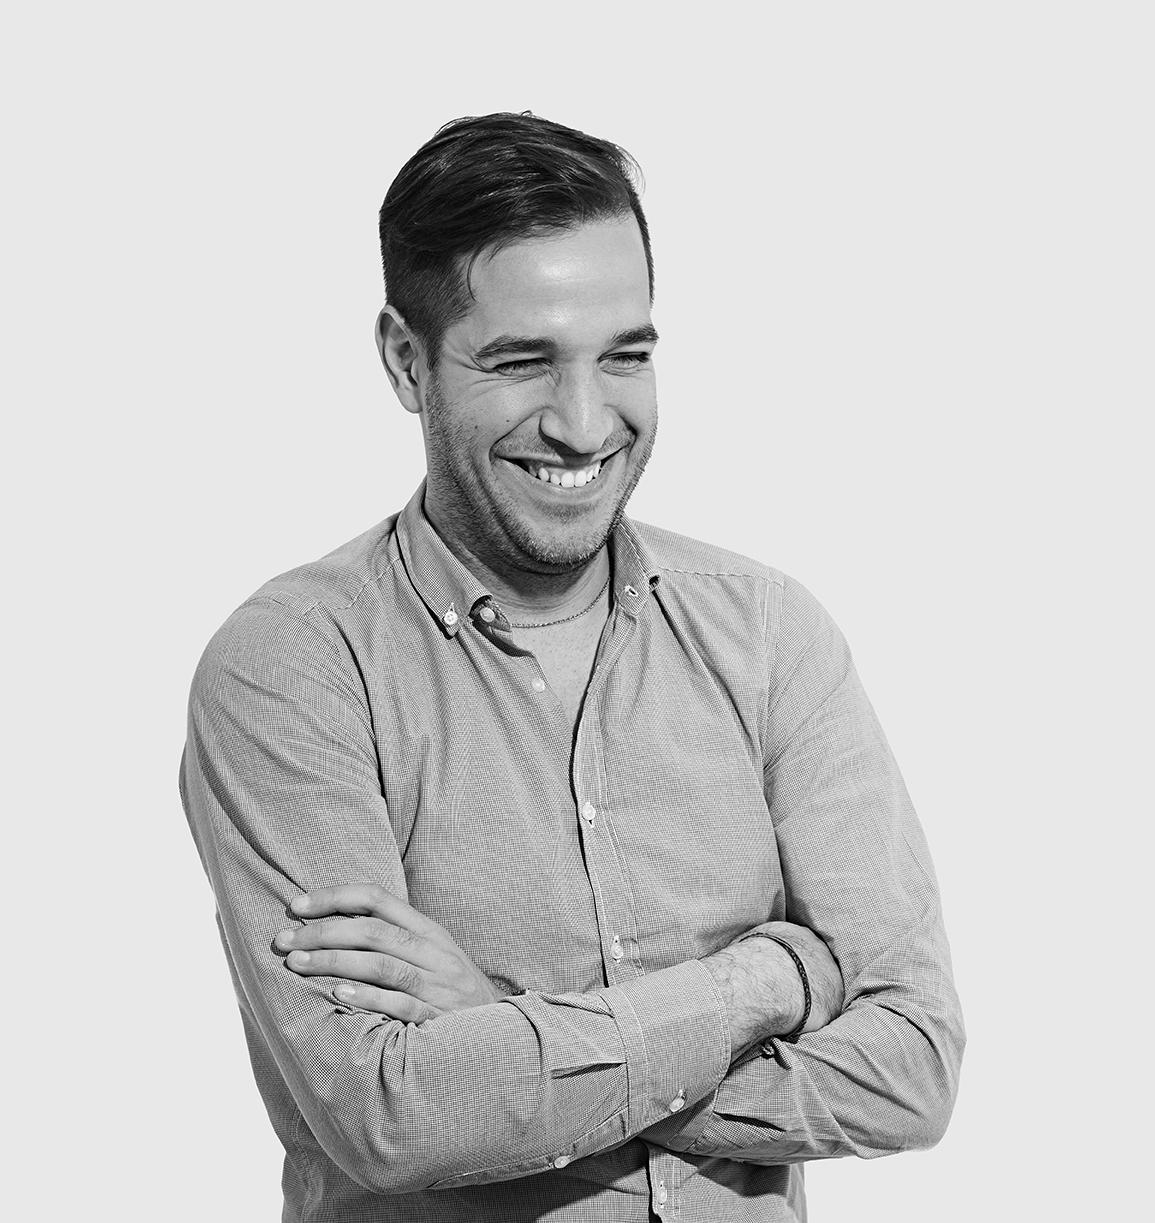 Matteo Tranquillo